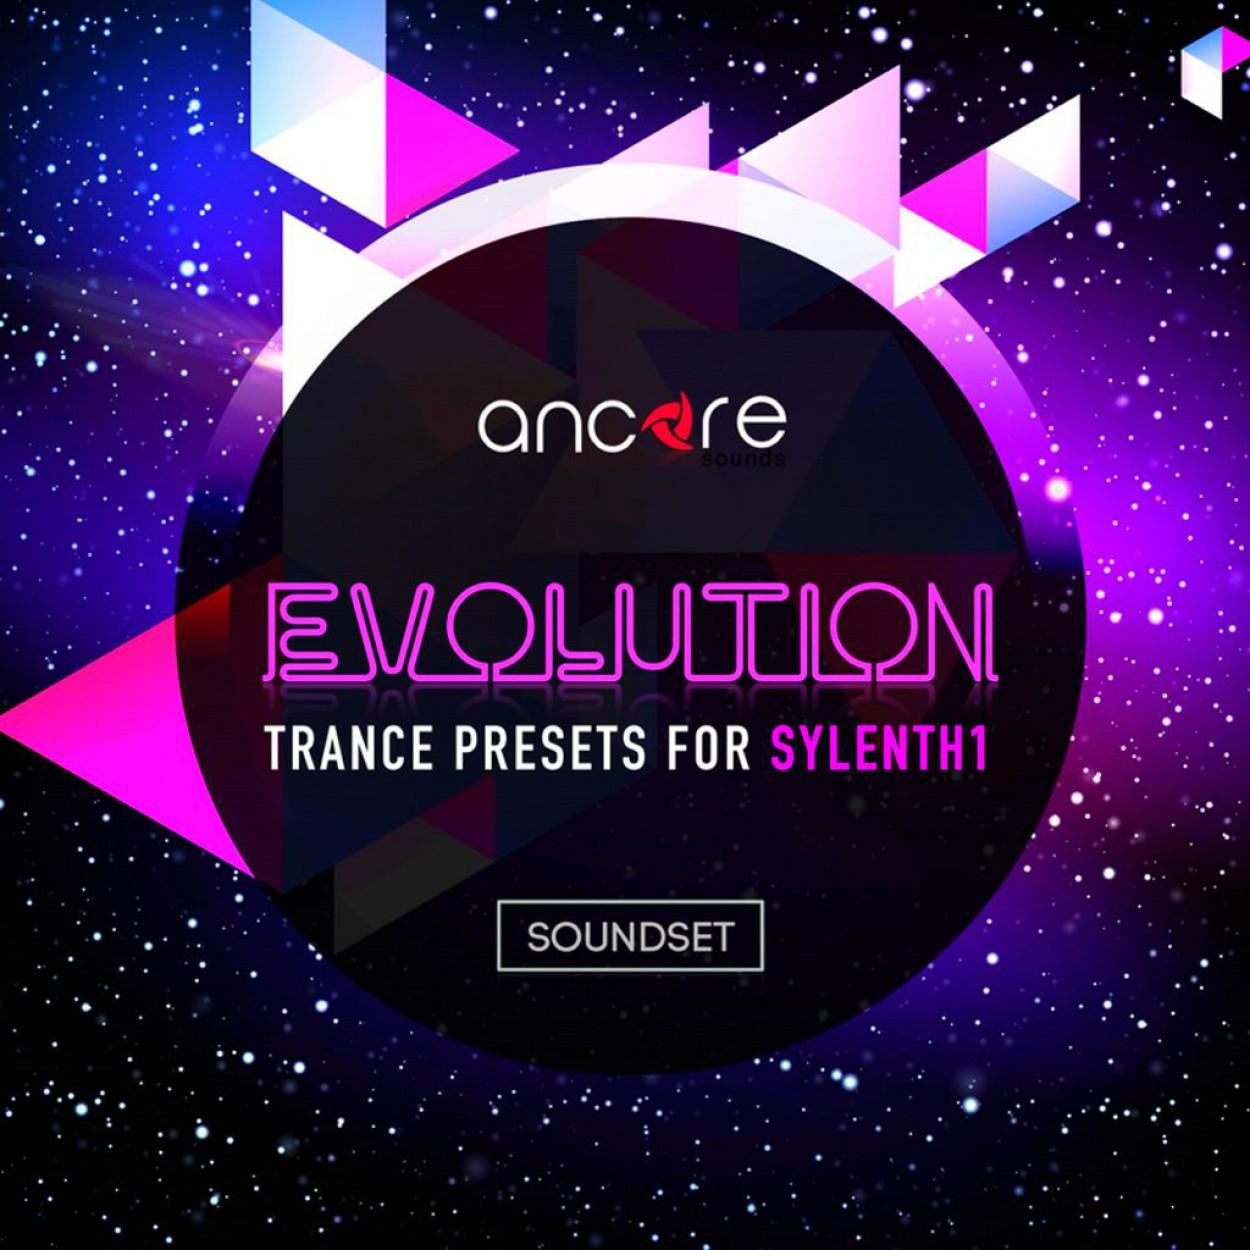 Evolution Trance For Sylenth1